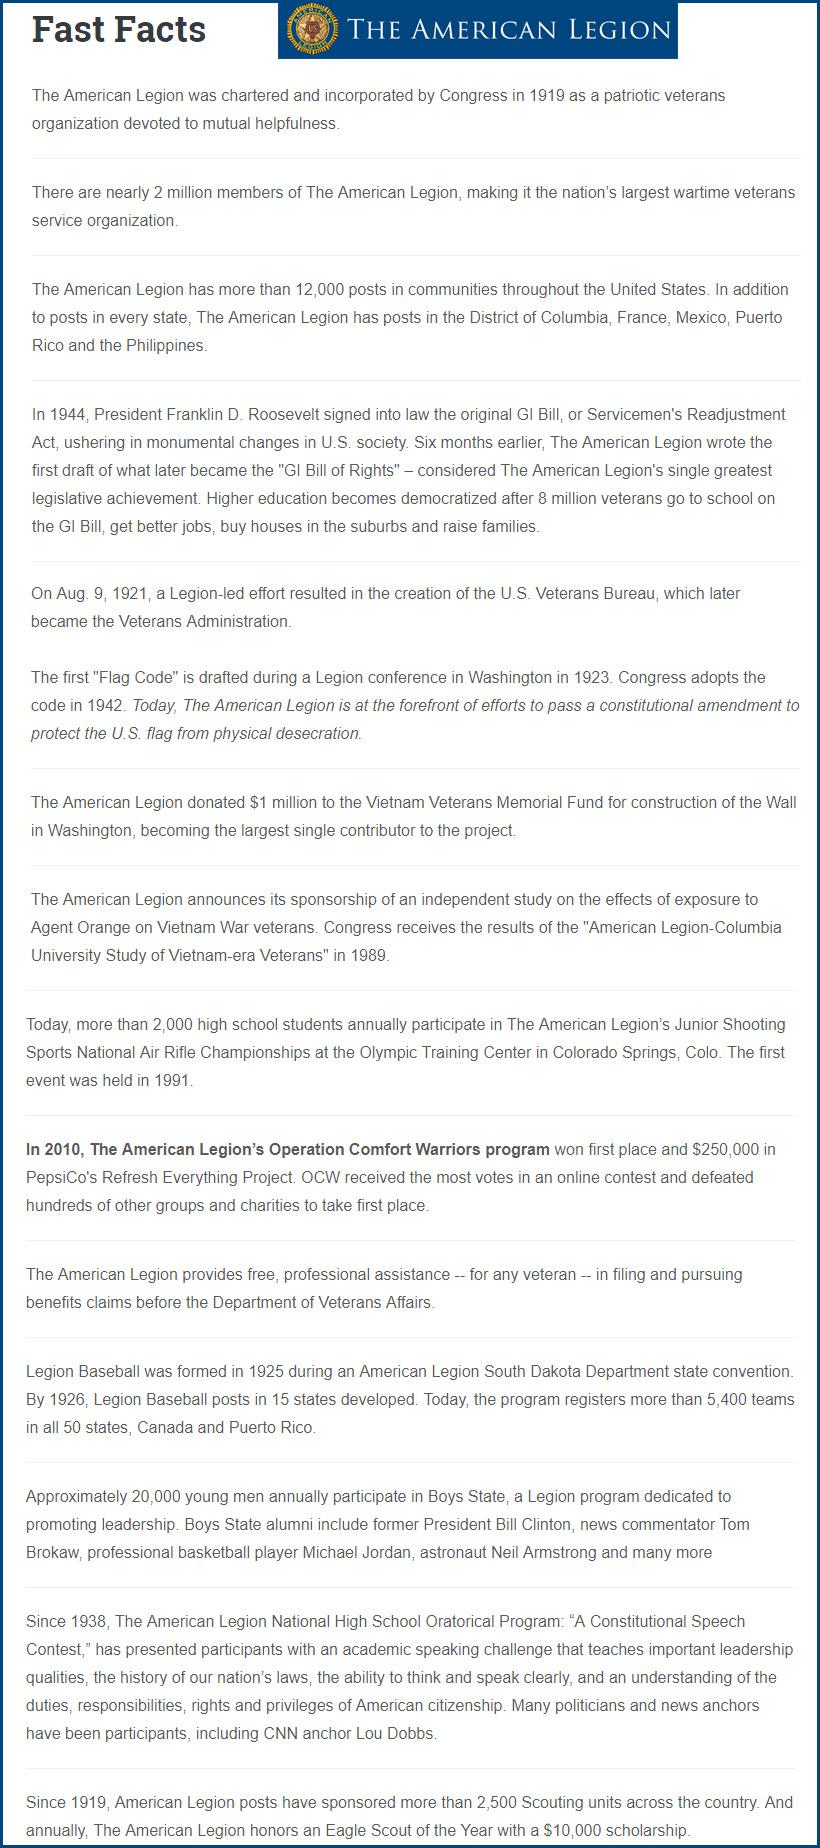 Fast Facts Americon Legion.jpg